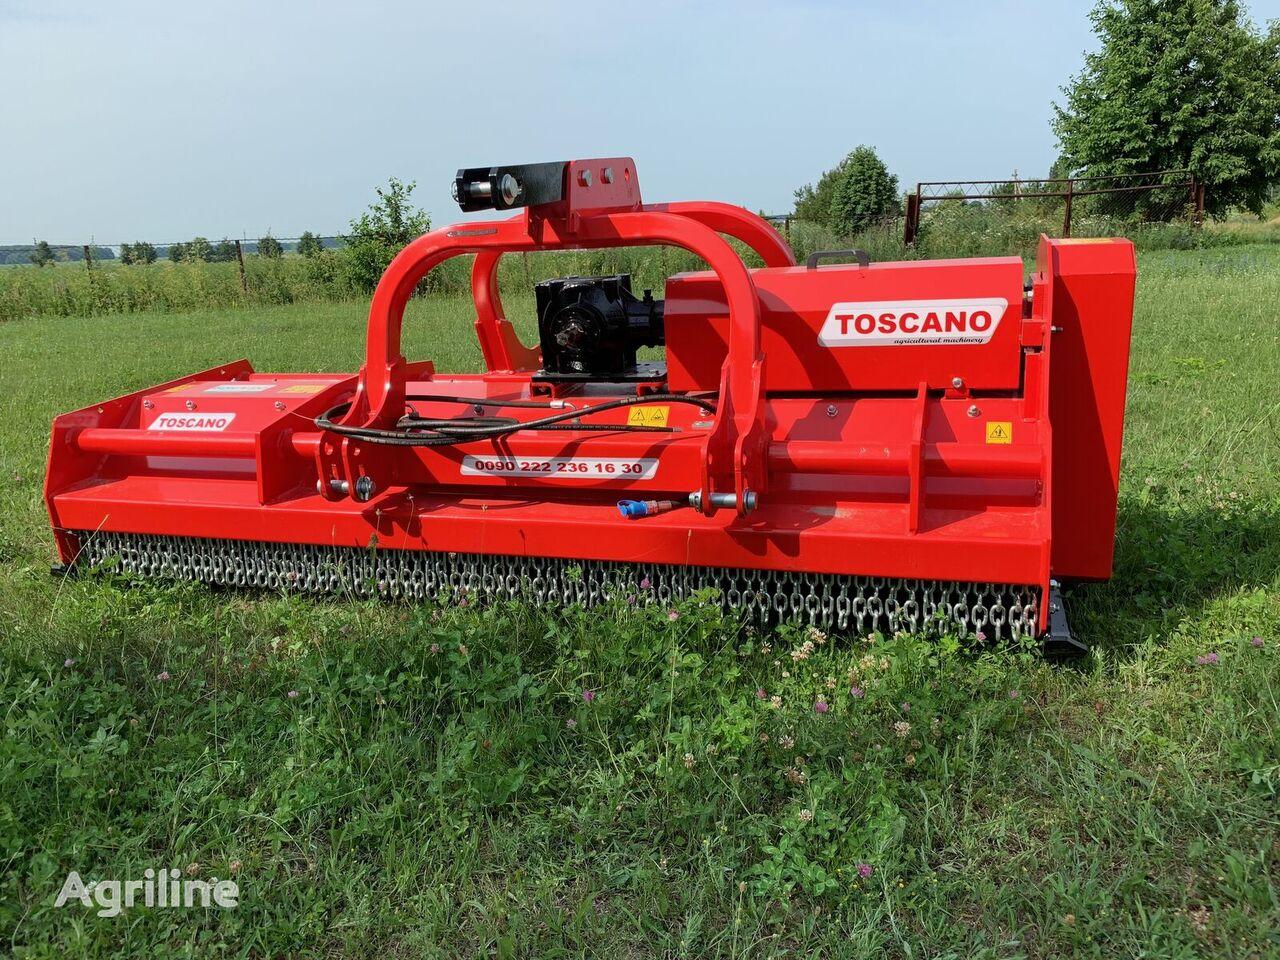 new TOSCANO DPKC-03 2400 mulcher